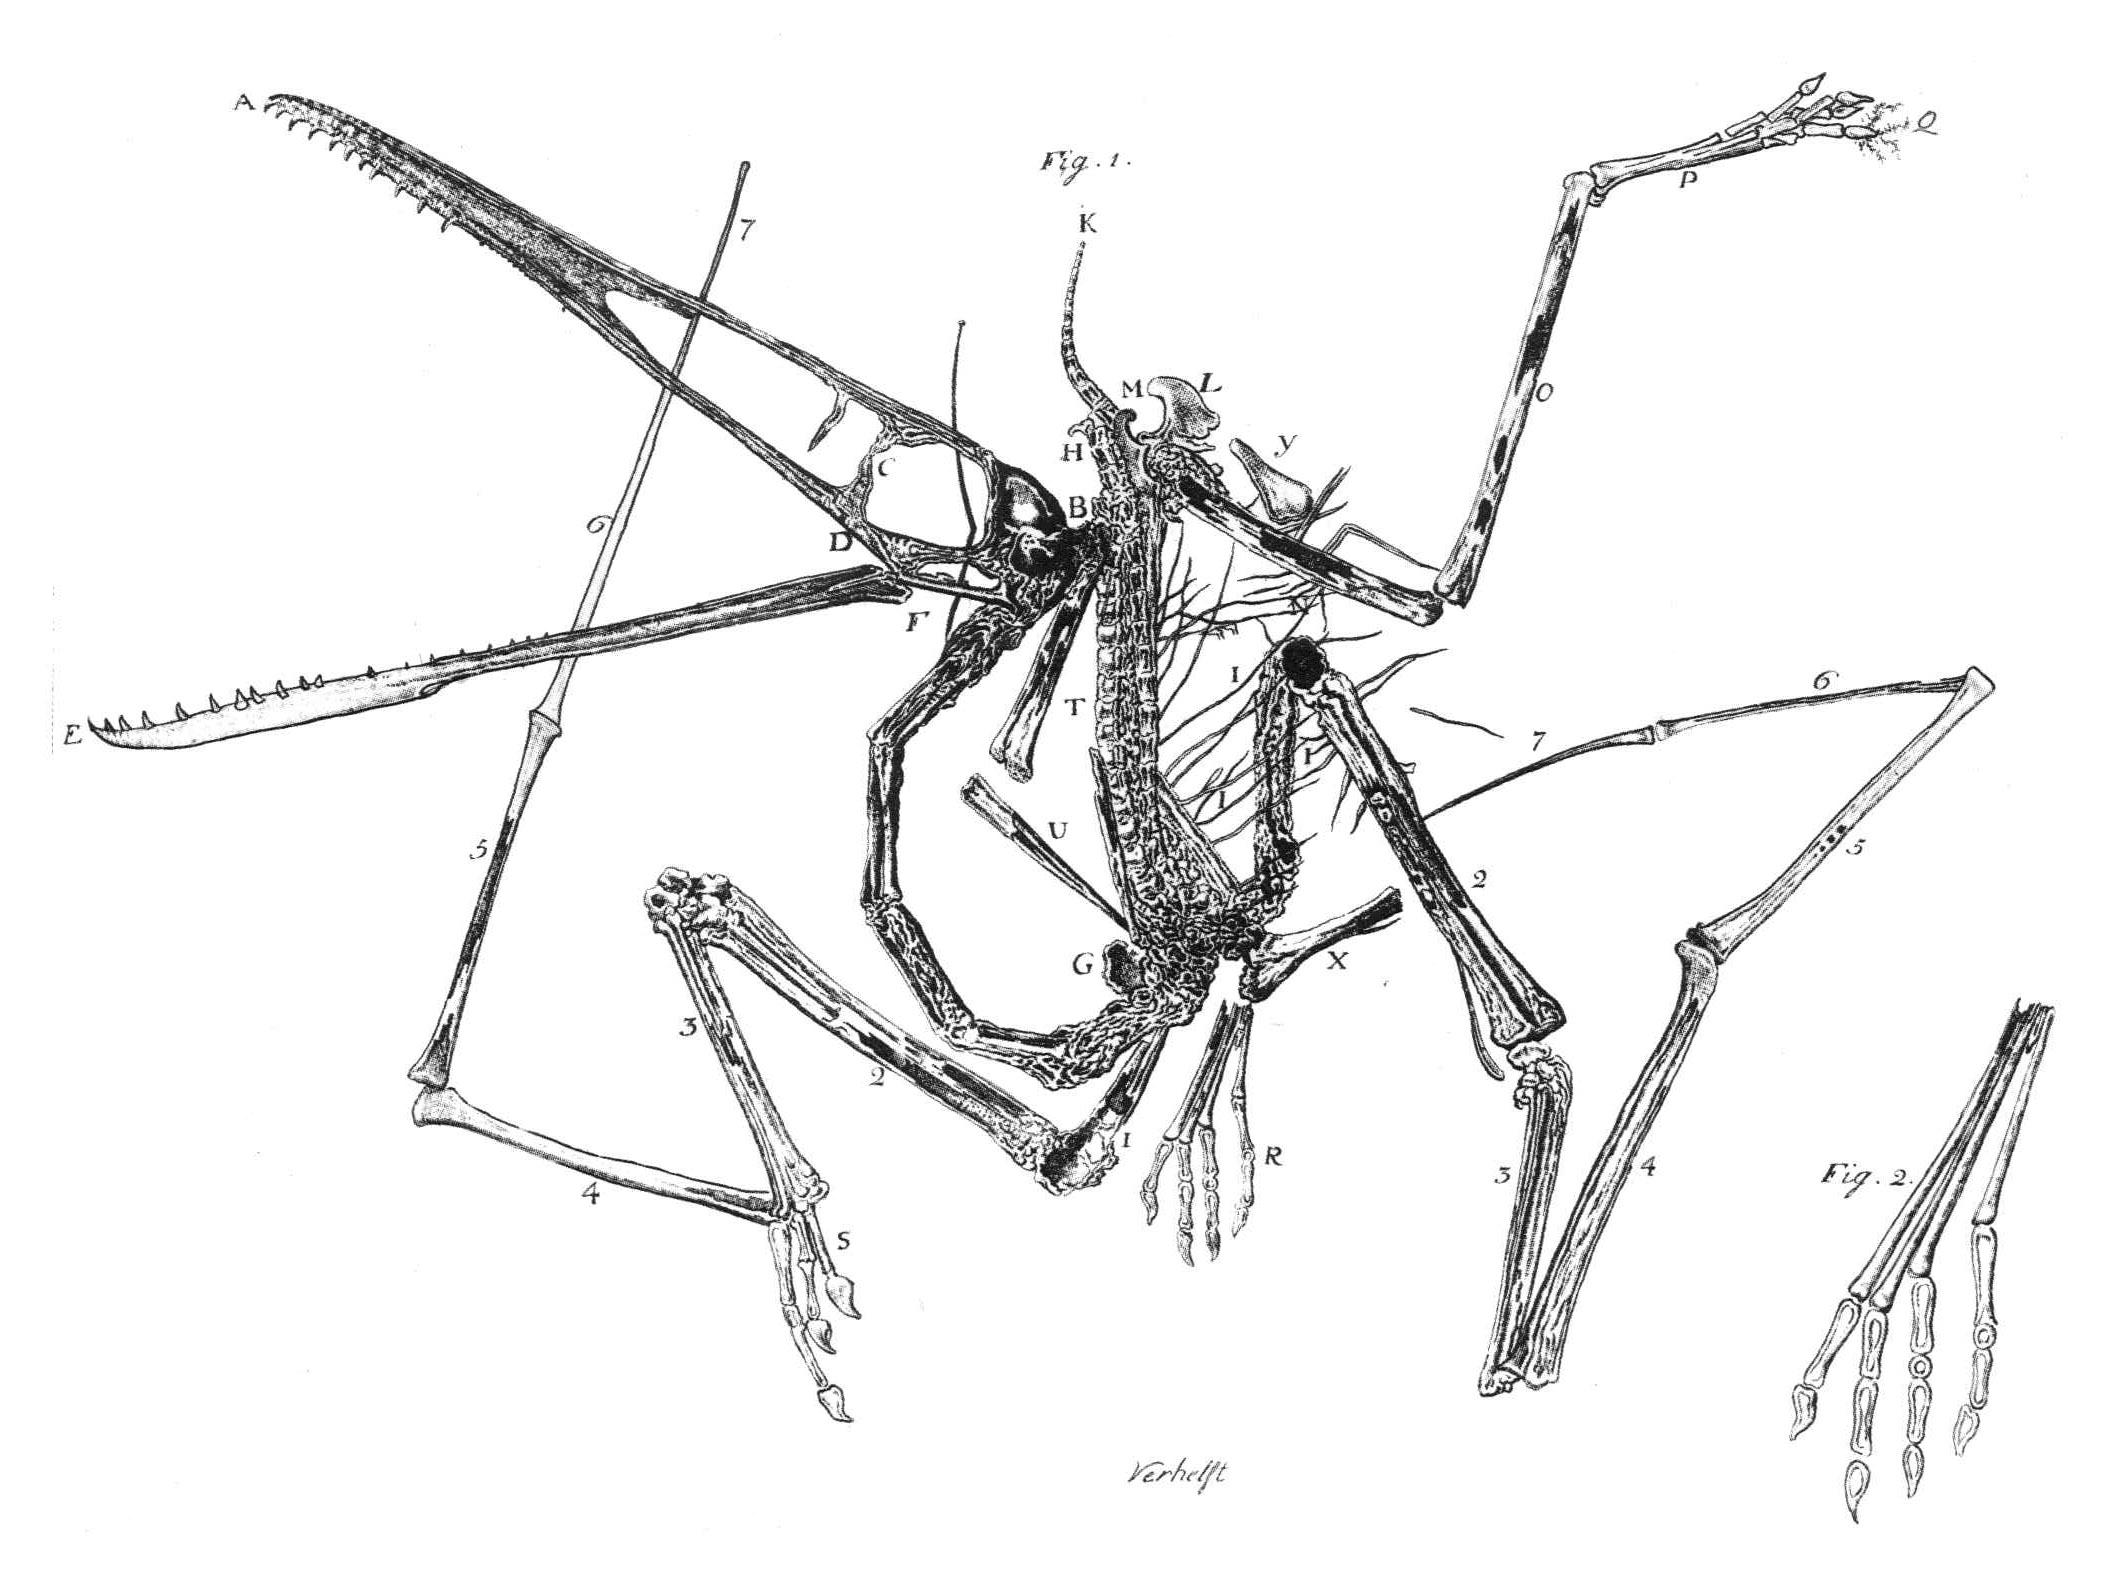 https://i0.wp.com/upload.wikimedia.org/wikipedia/commons/c/cf/Pterodactylus_holotype_Collini_1784.jpg